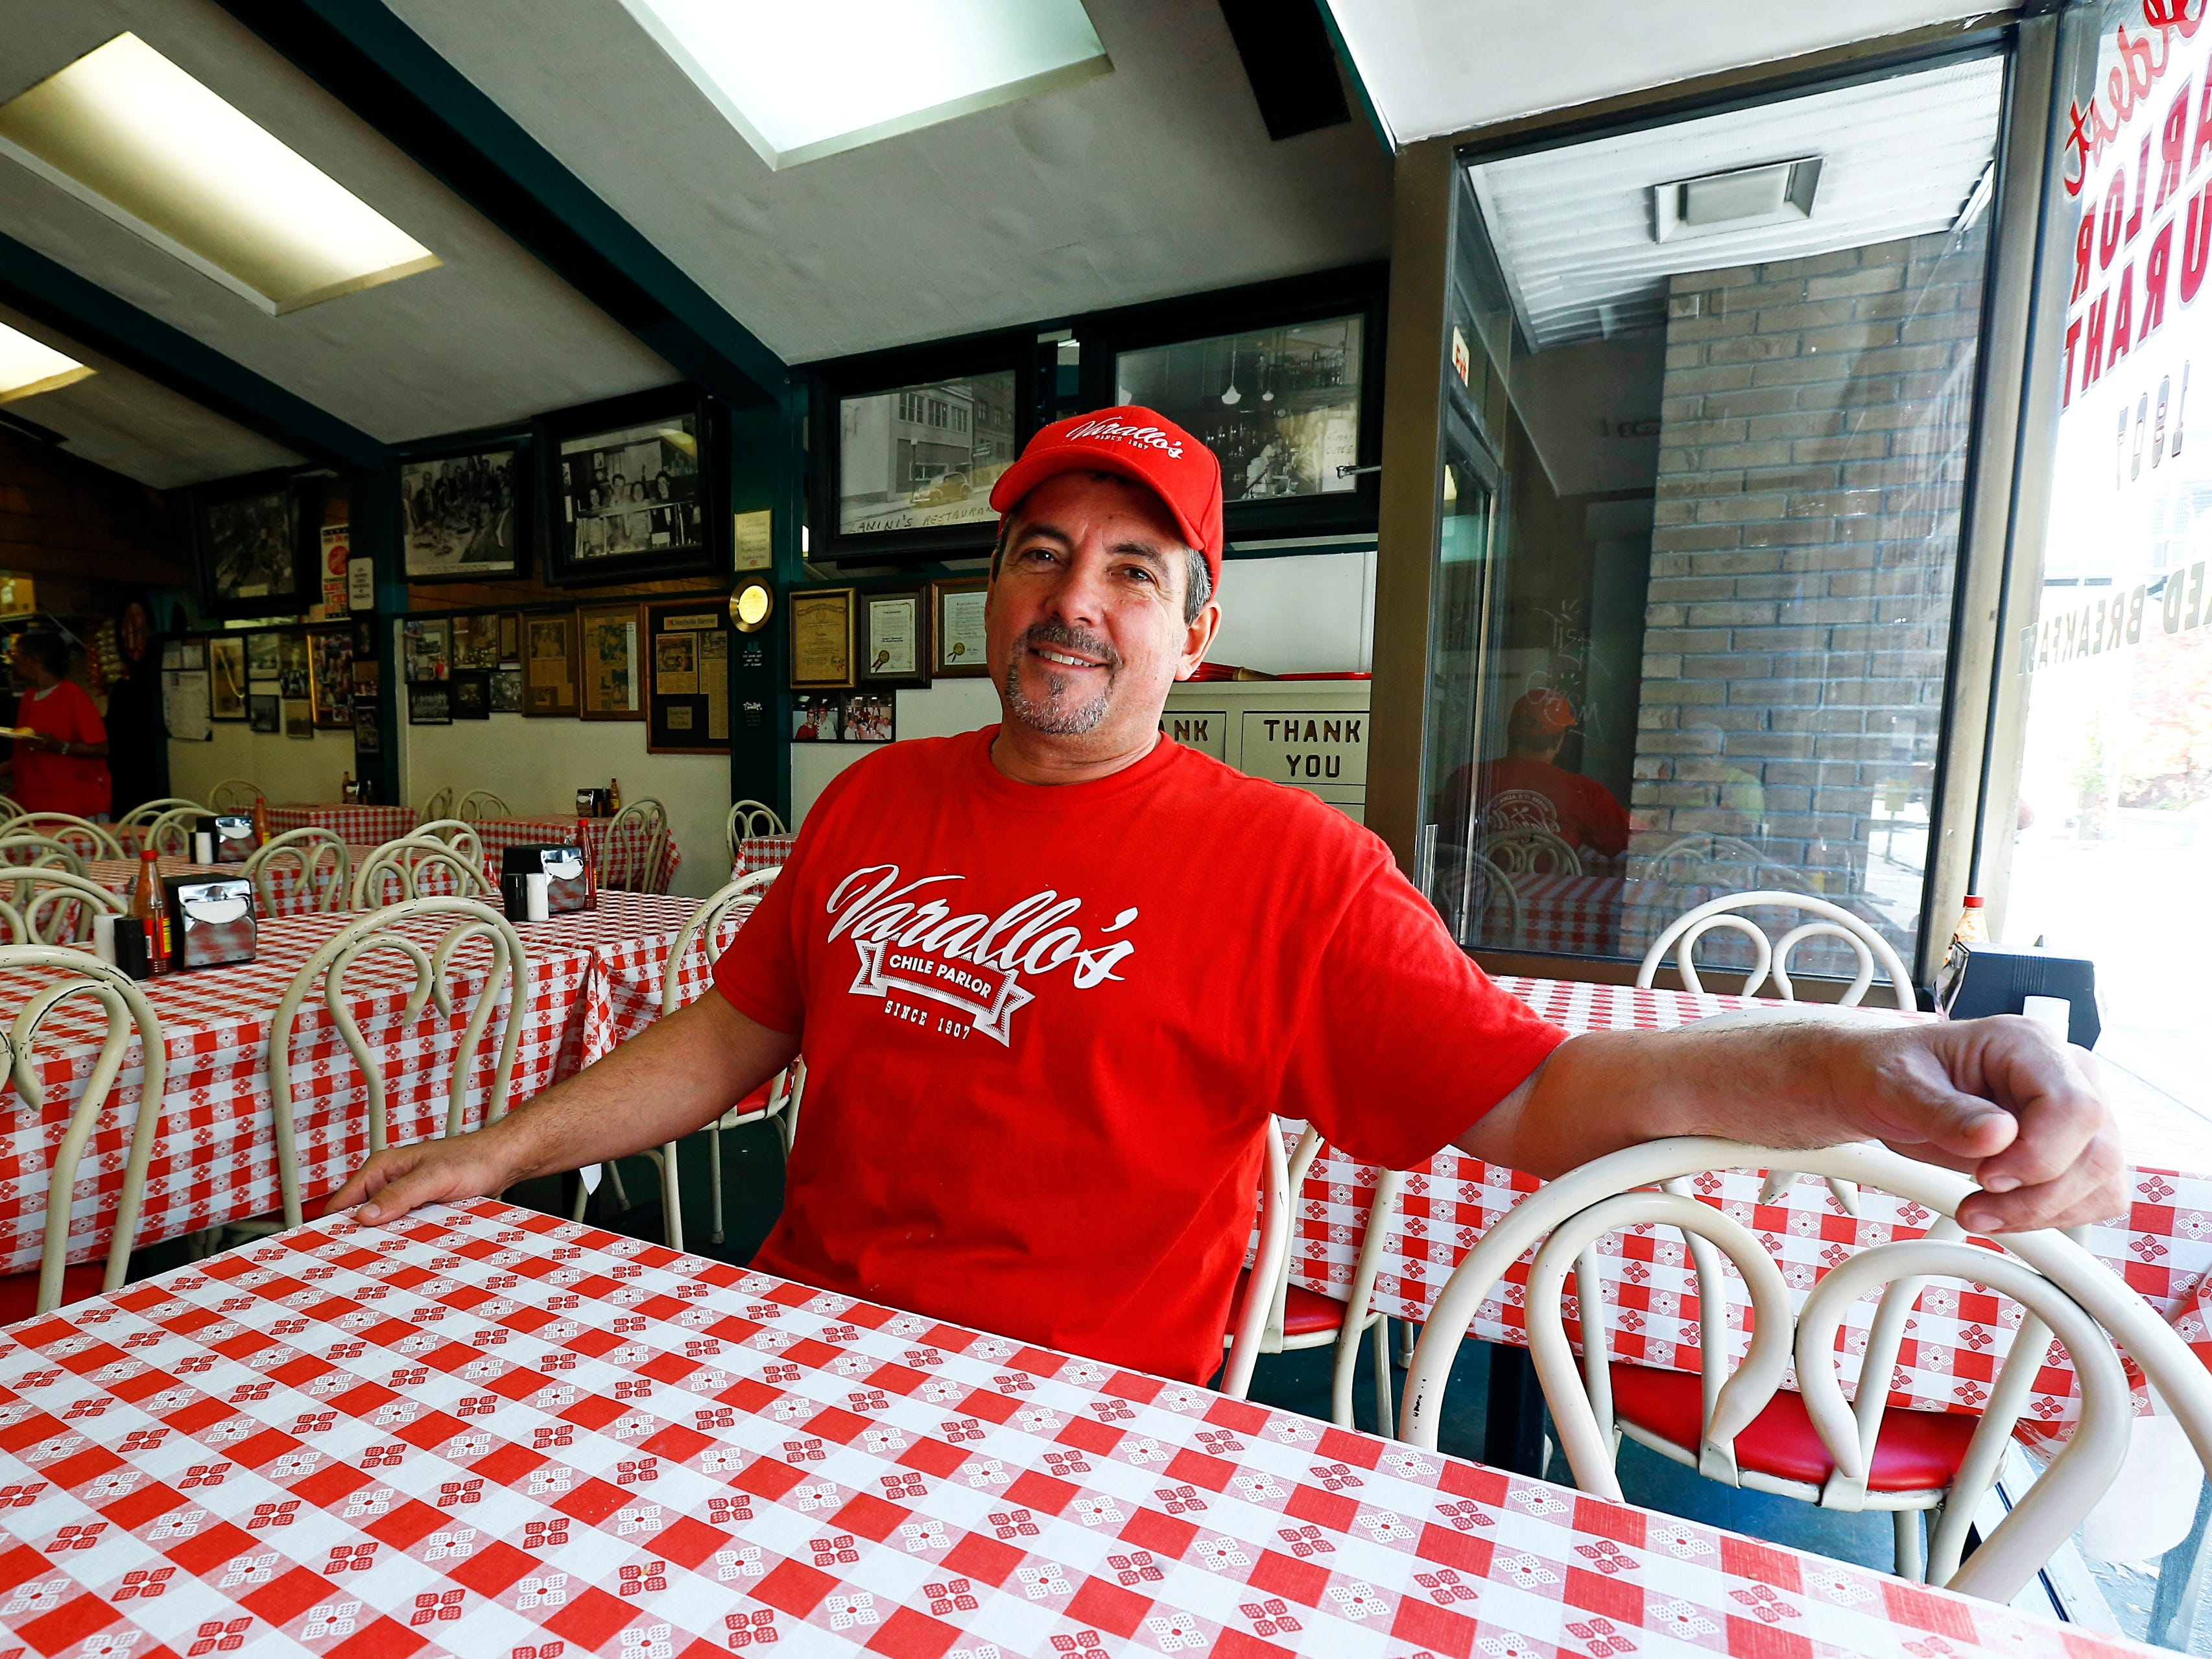 Todd Varallo, owner of Varallo's Chile Parlor & Restaurant, is seen Monday, Oct. 29, 2018, in Nashville, Tenn.